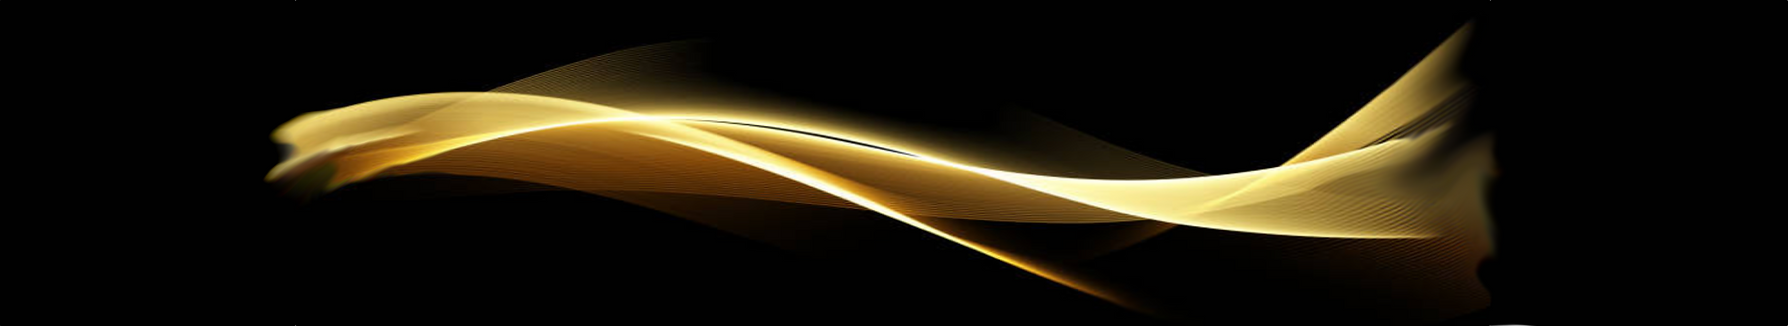 Gold Swash 2.png